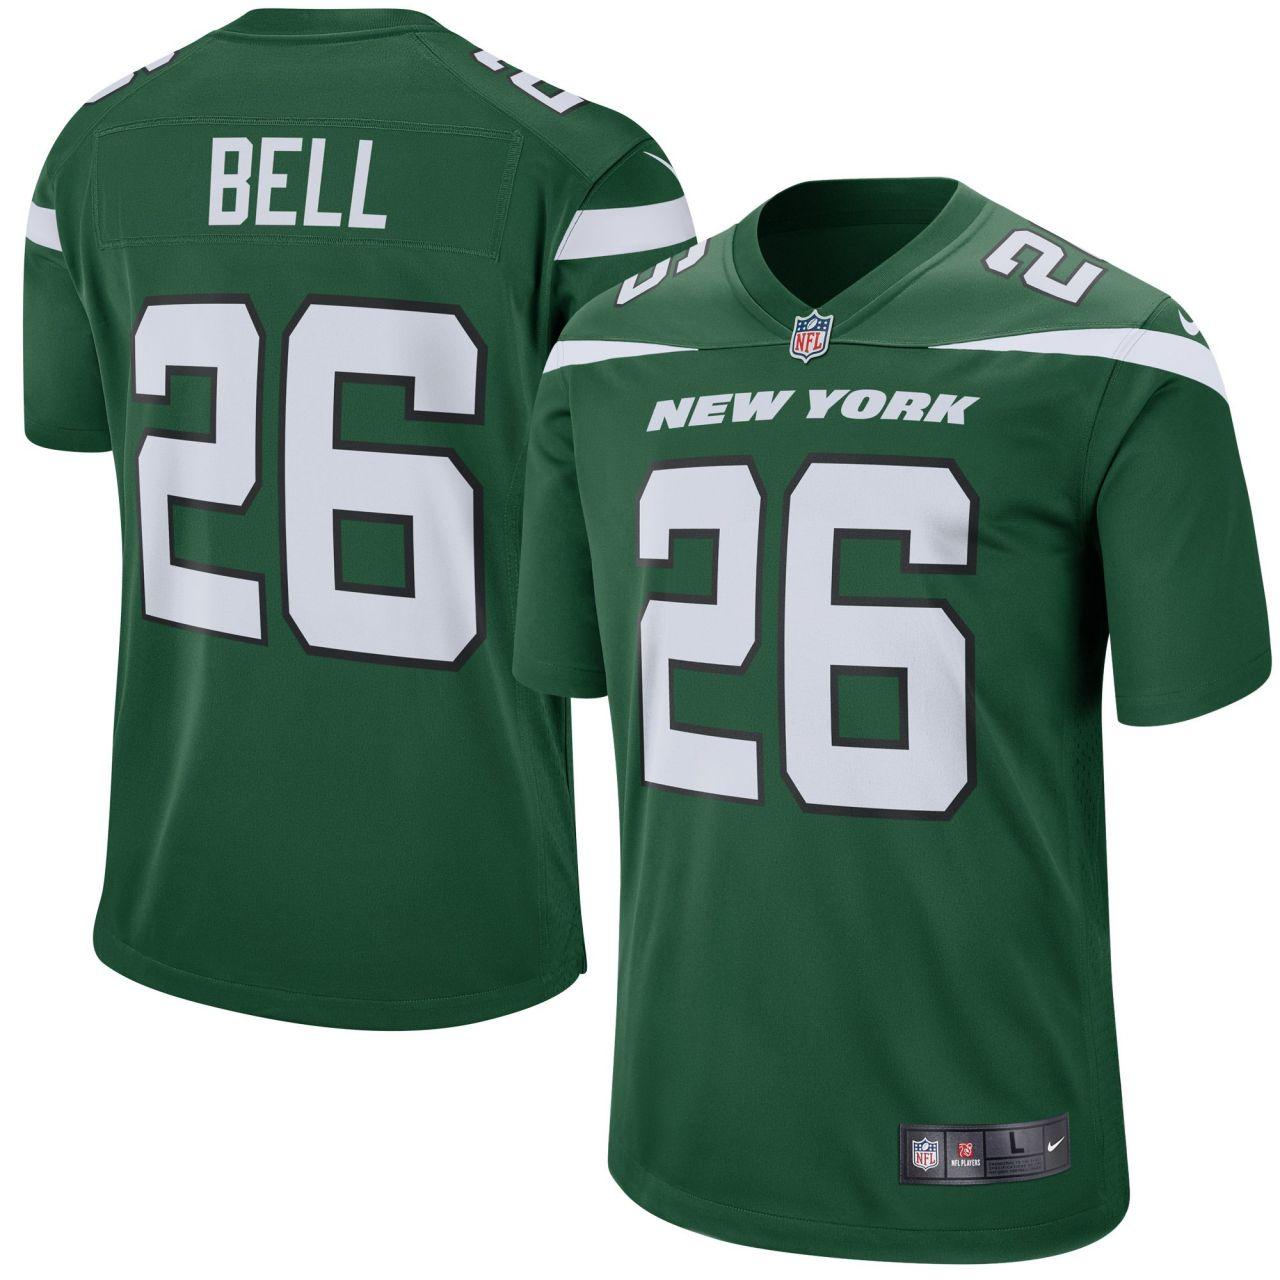 amfoo - Nike GAME Jersey Trikot New York Jets #26 LeVeon Bell